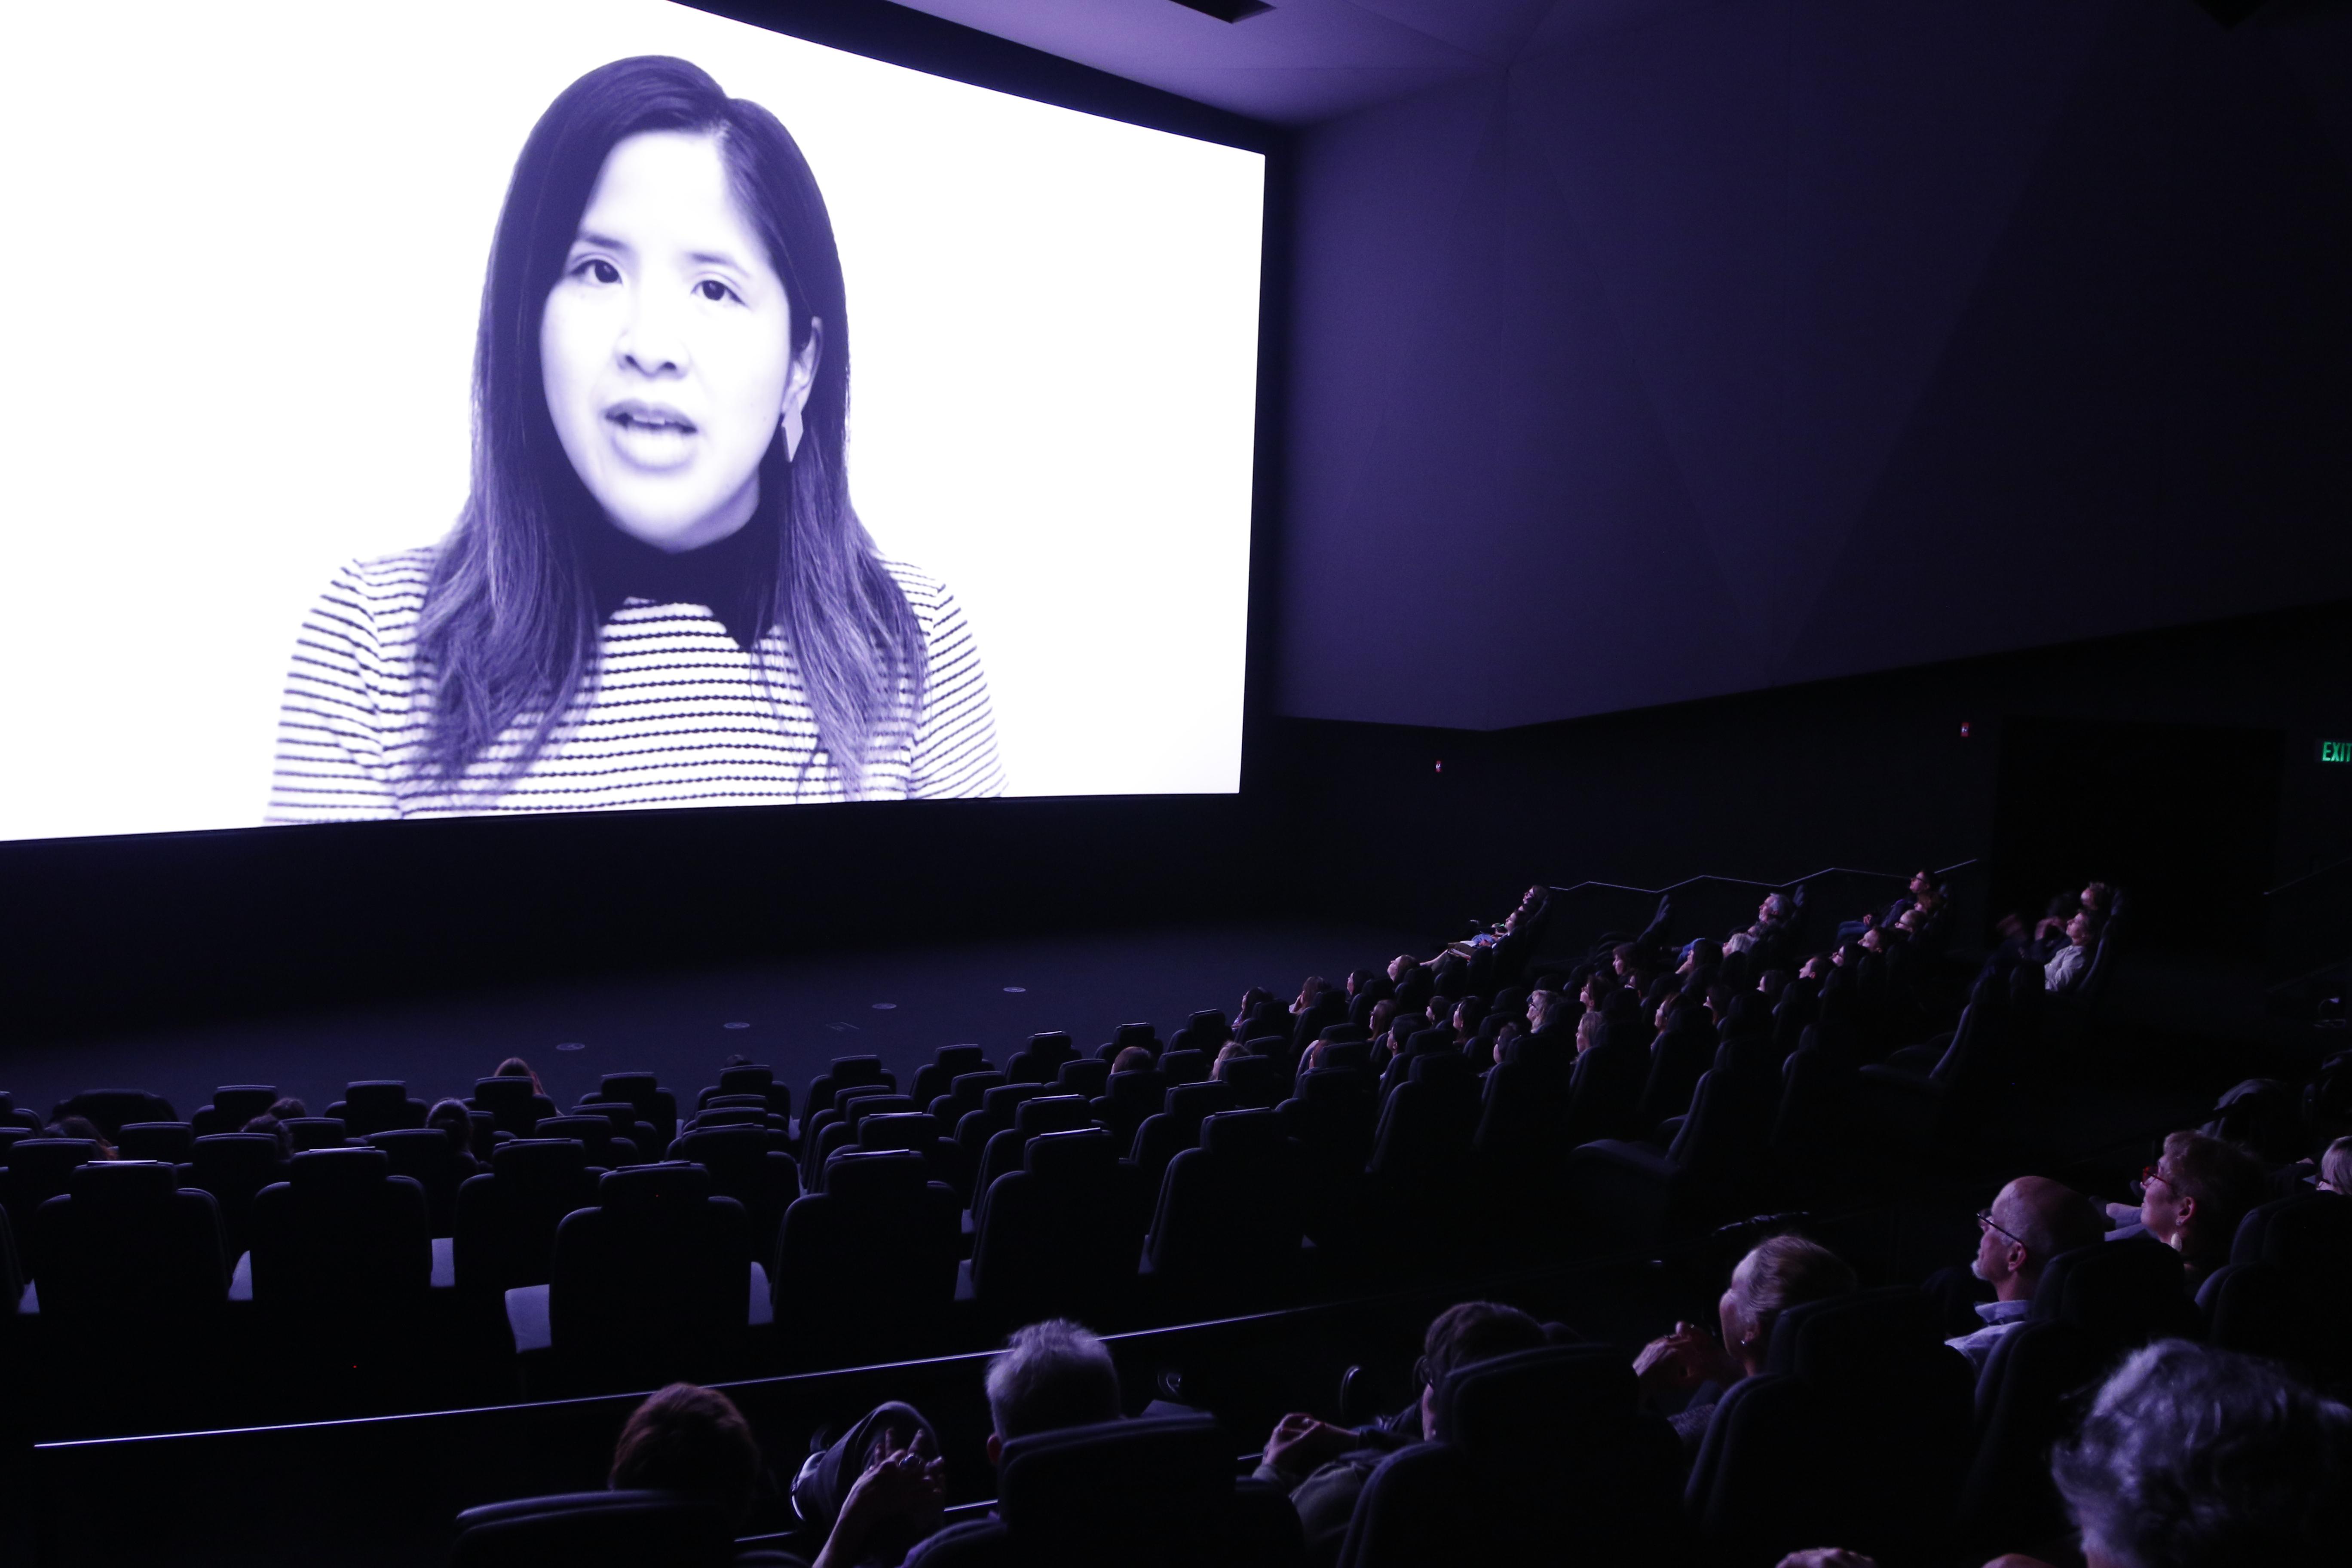 2019 LUNAFEST 'Flip The Record' in Dolby Cinema